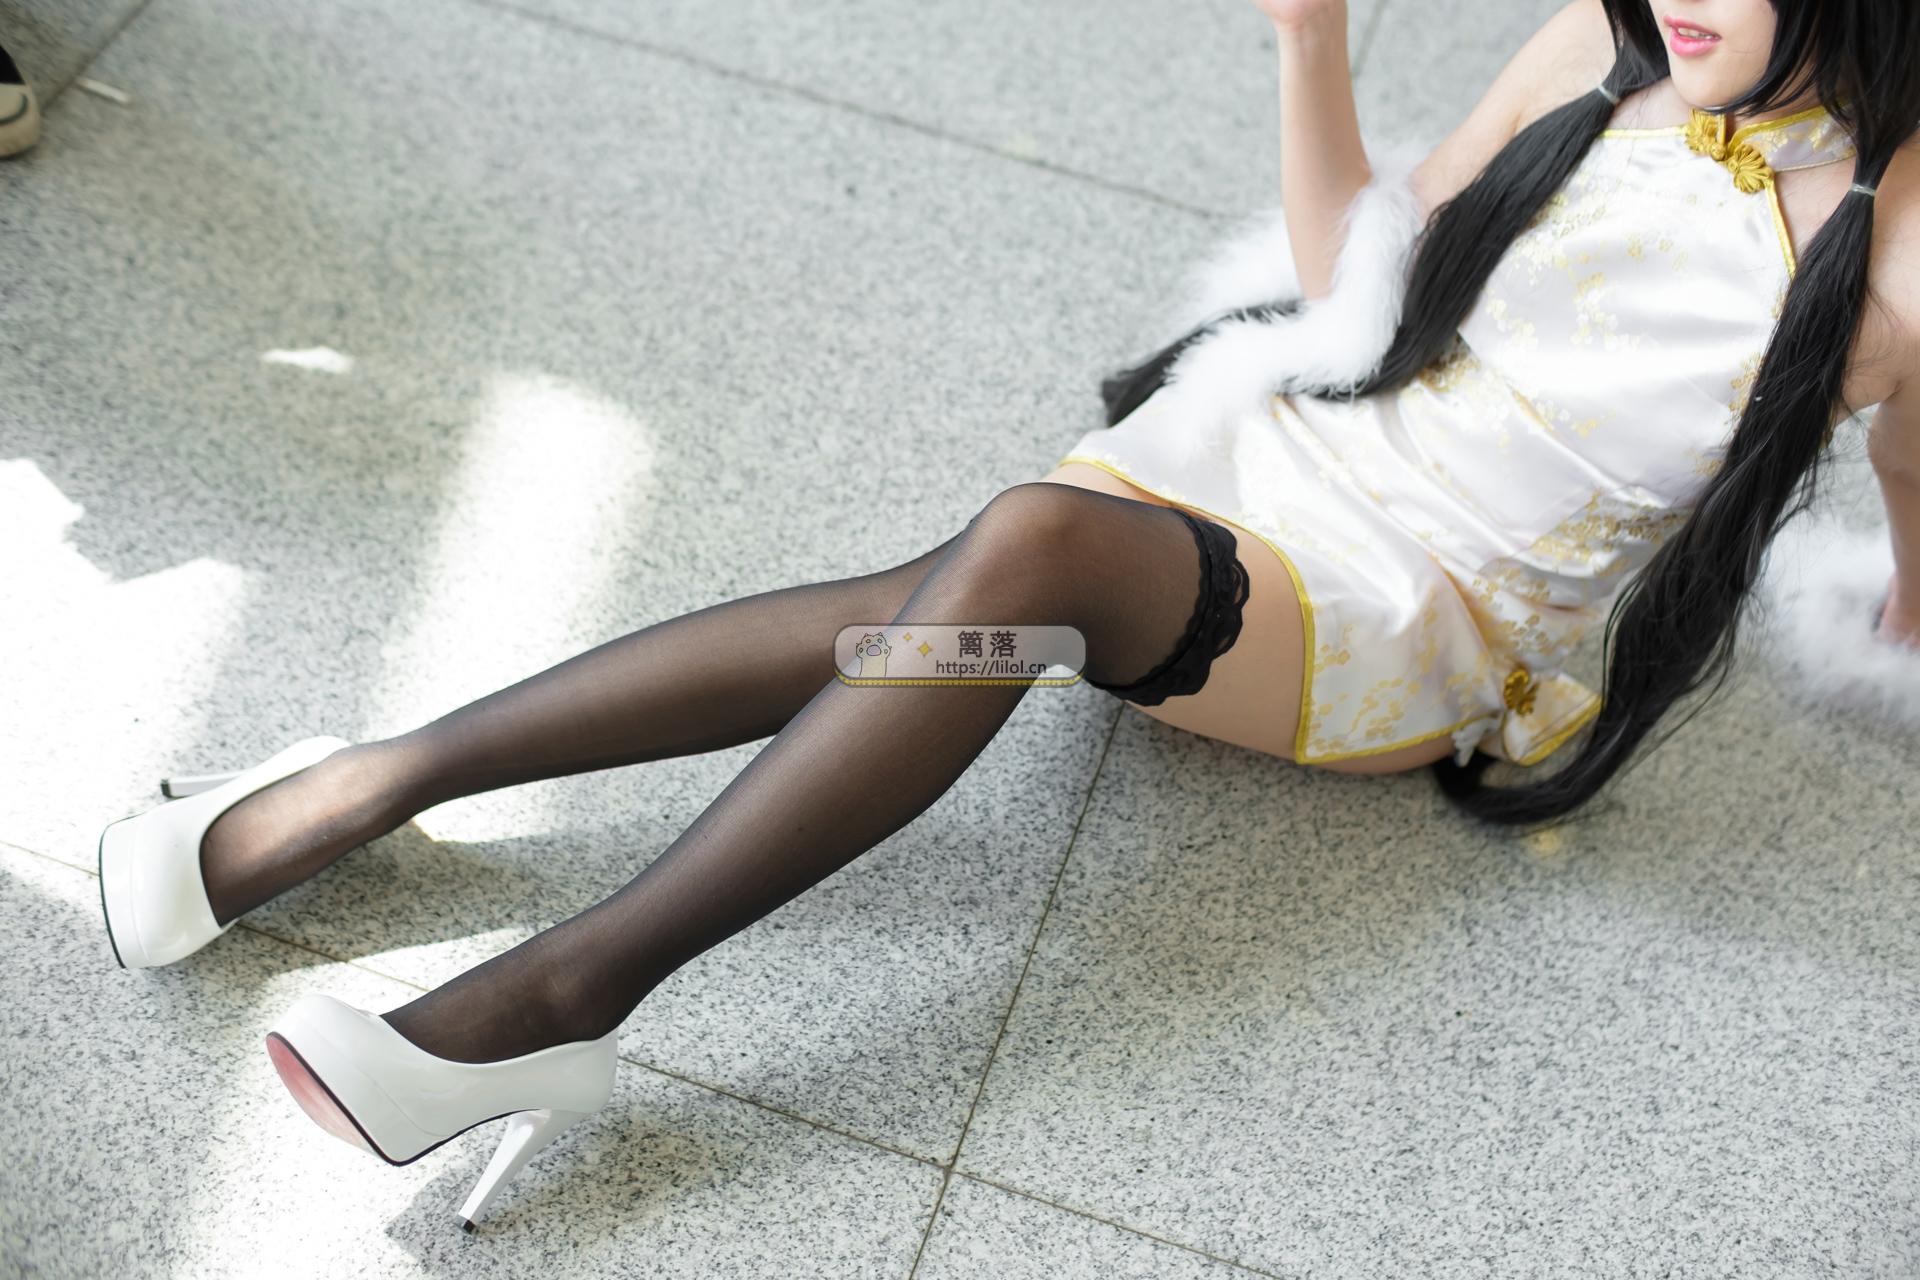 【FREE系列】森萝财团写真 FREE-005 中筒黑丝cosplay性感长腿特写 [64图-0视频-381MB] FREE系列 第6张